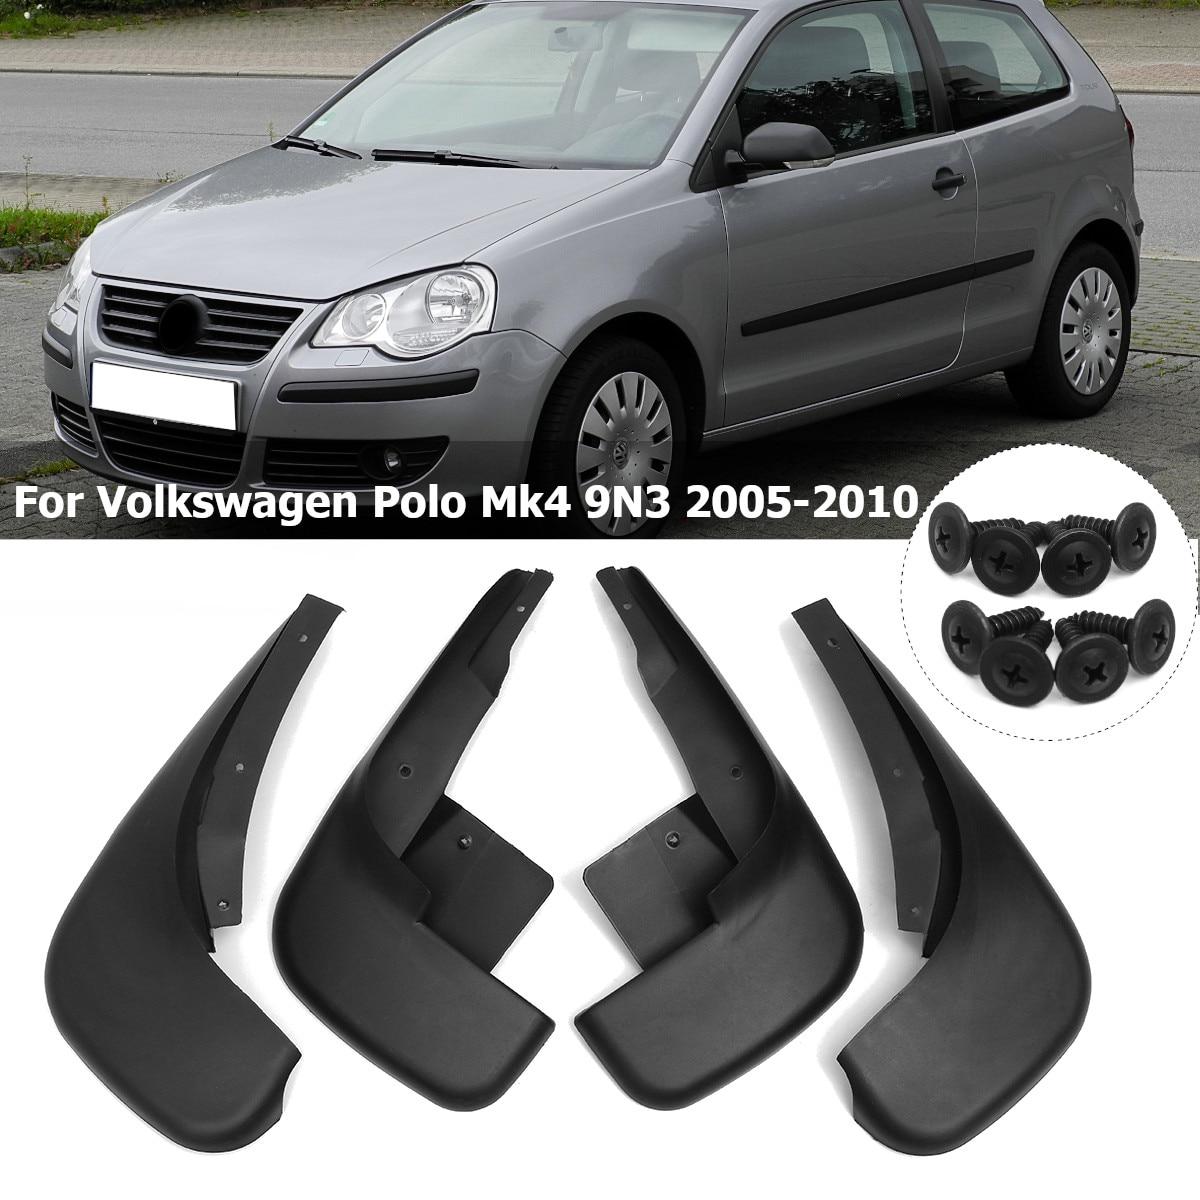 Mud flaps para vw polo mk4 9n3 2005-2009 carro fender respingo guarda pára-lamas dianteiro traseiro acessórios